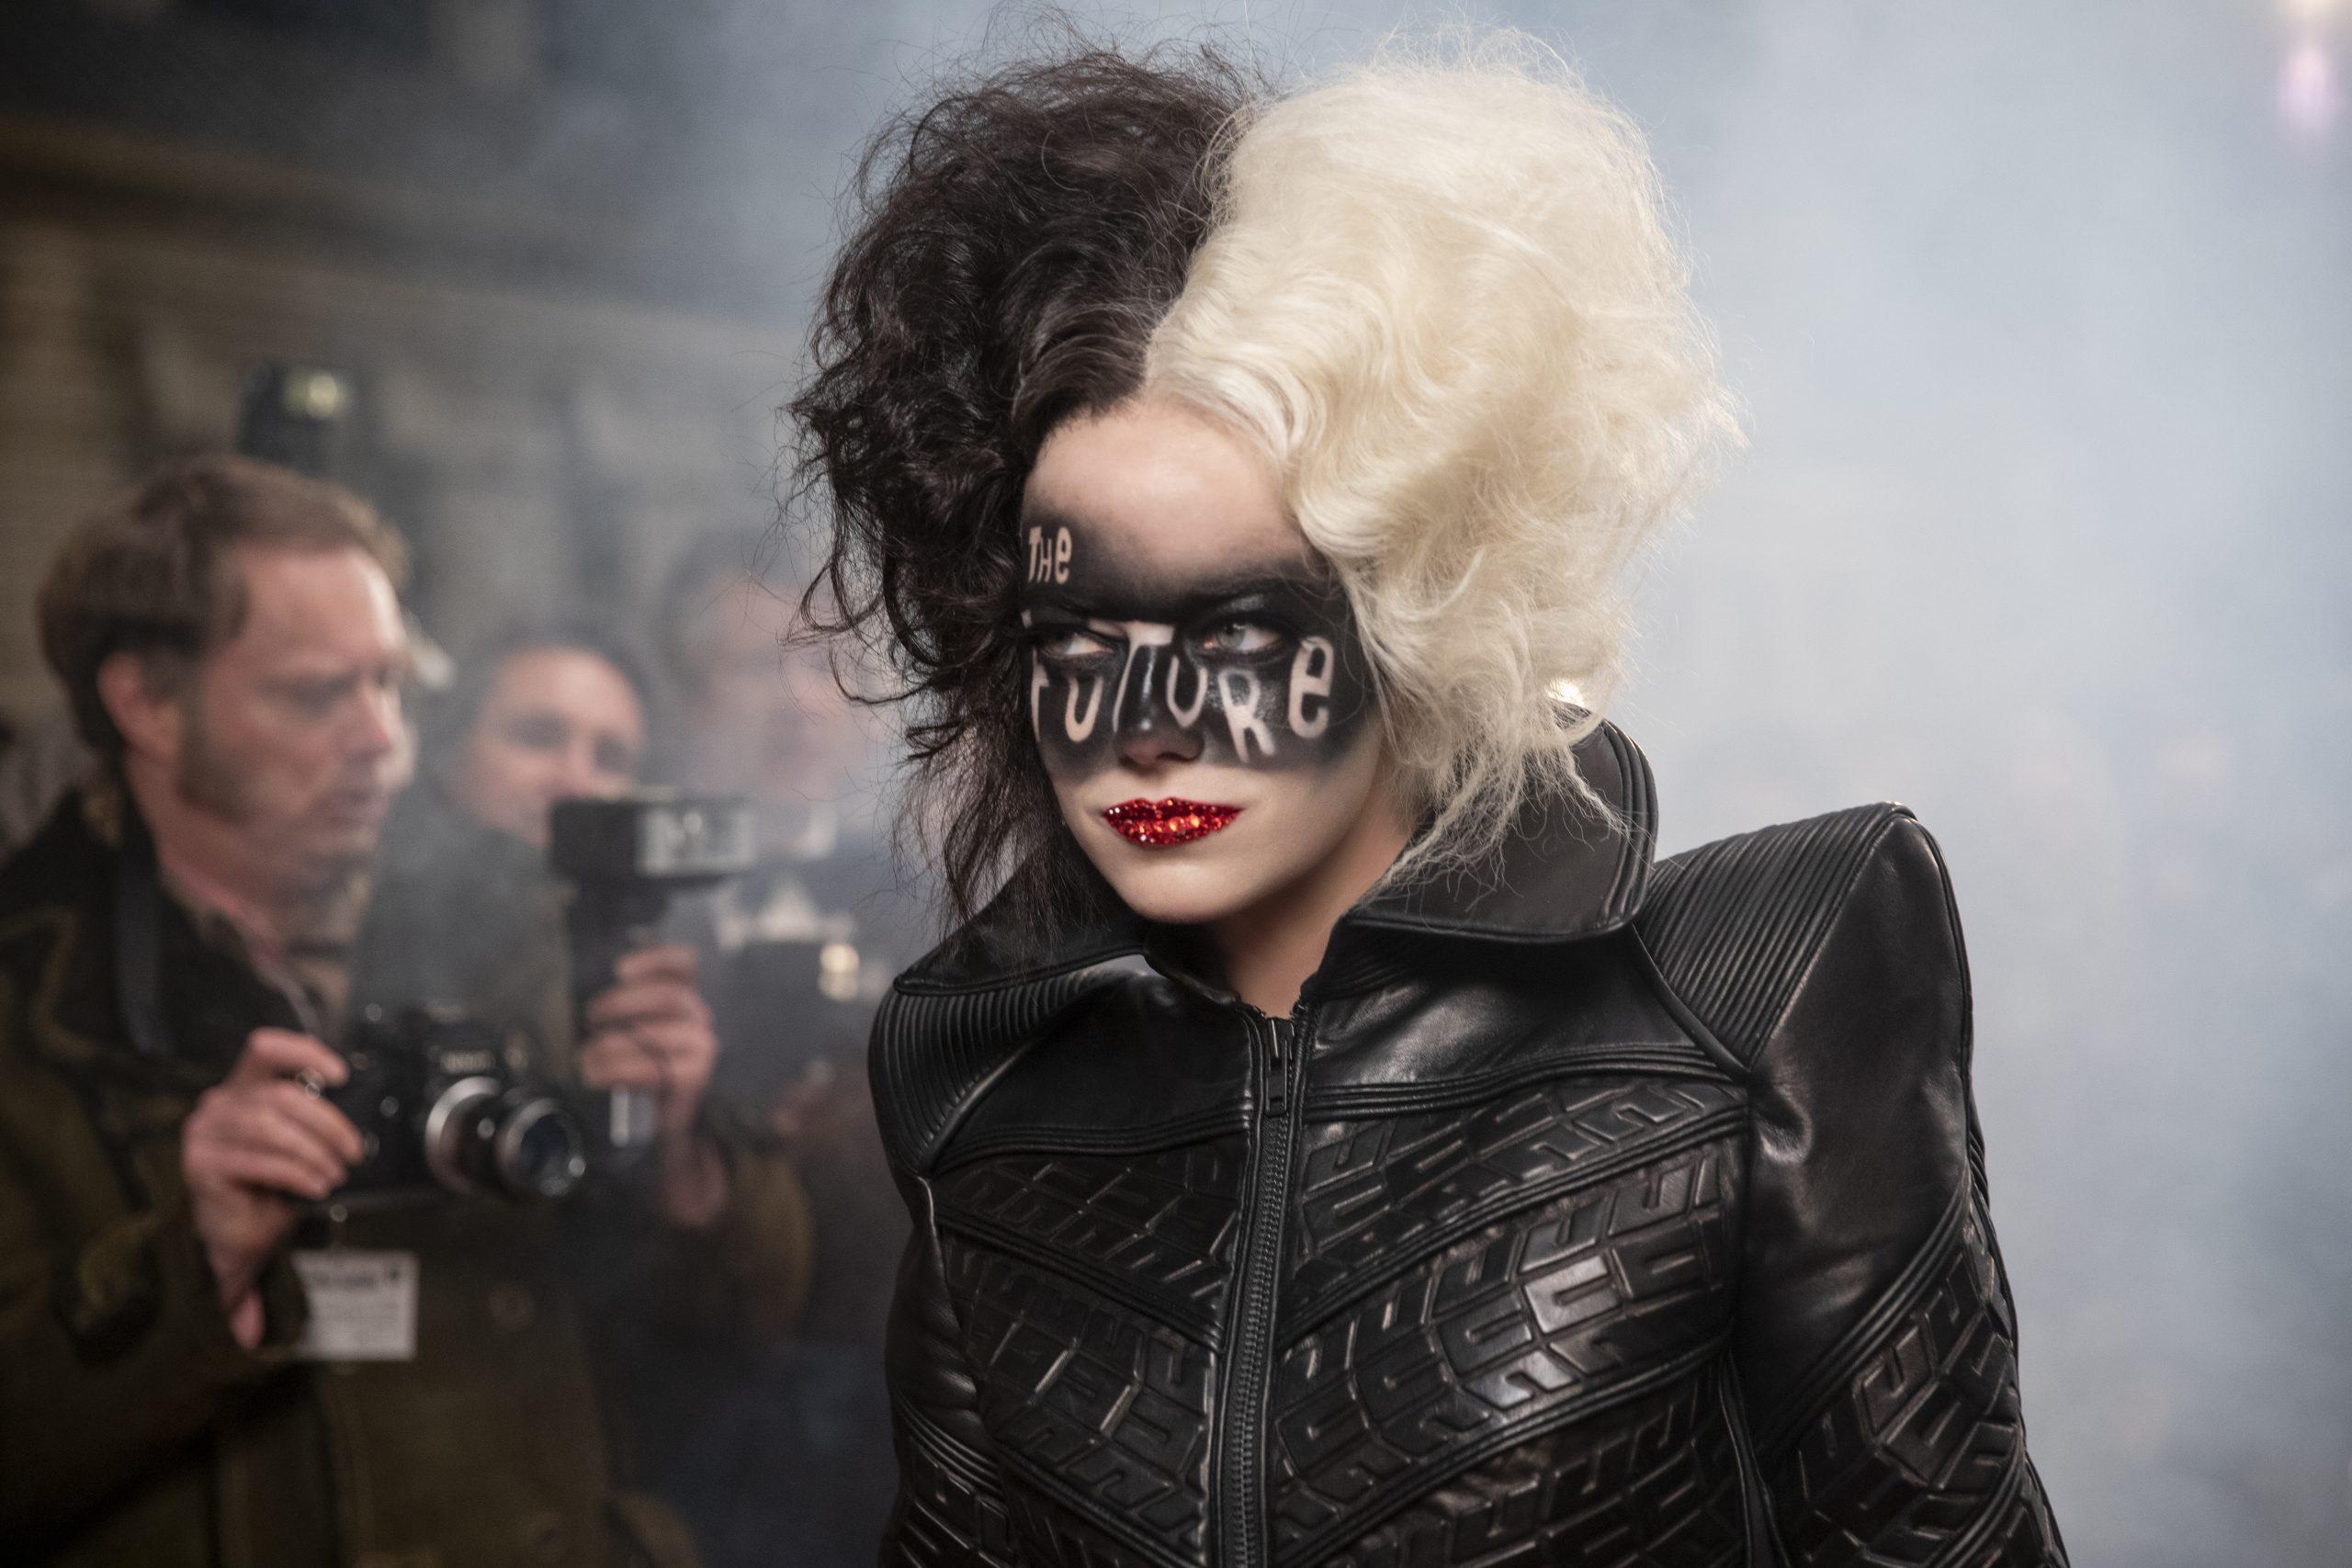 Sneak Peek: Disney's 'Cruella' Starring Emma Stone